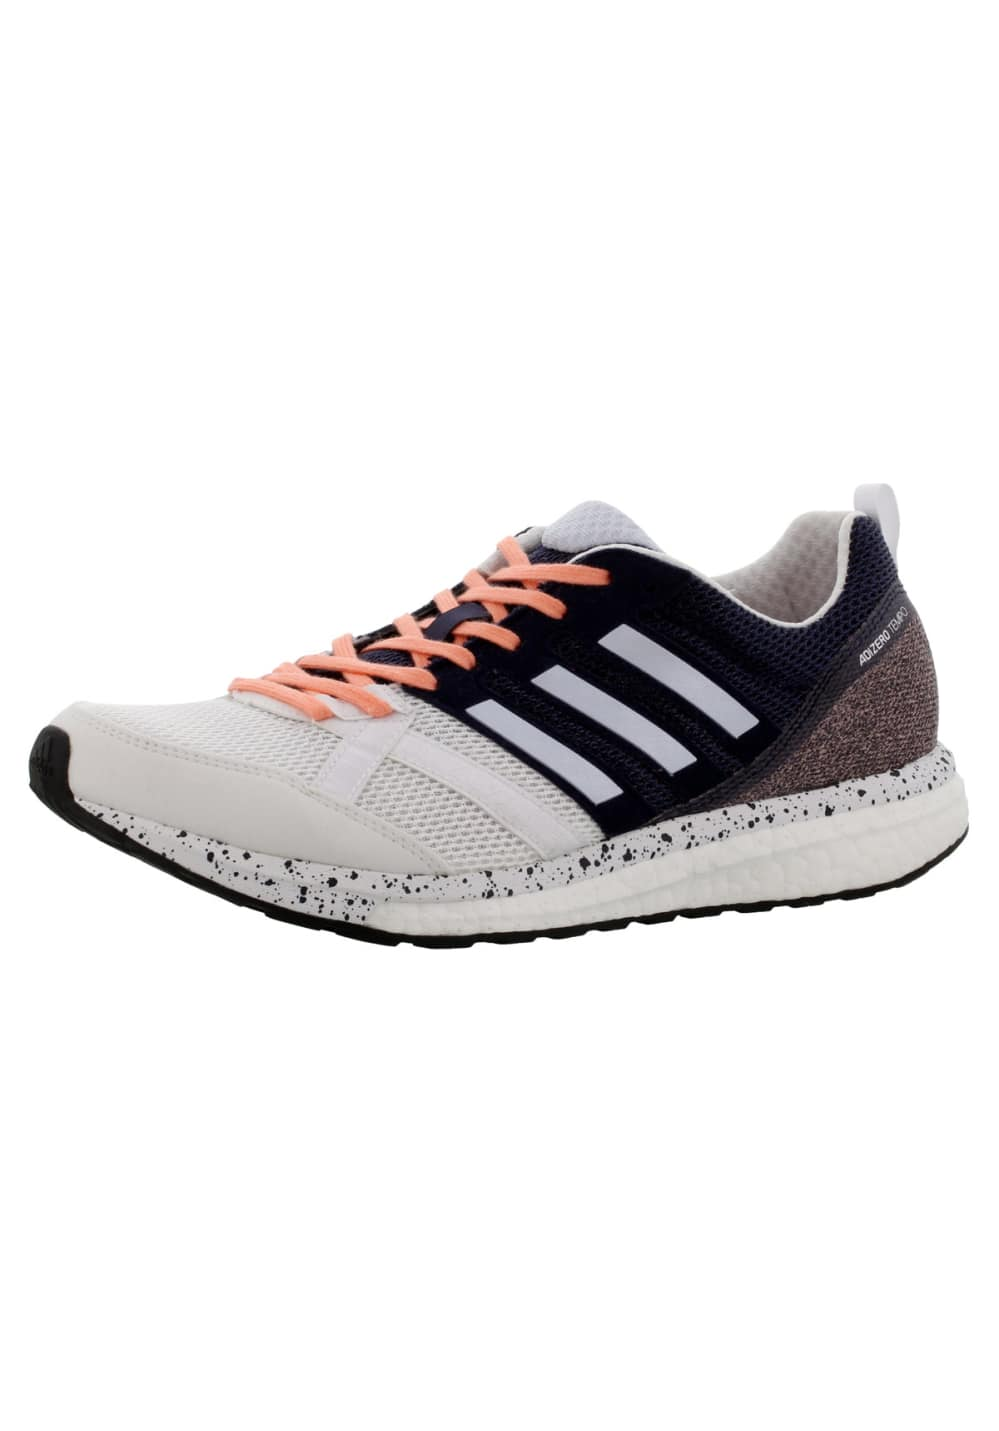 adidas adiZero Tempo 9 - Laufschuhe für Damen - Weiß   21RUN 540d23f96e